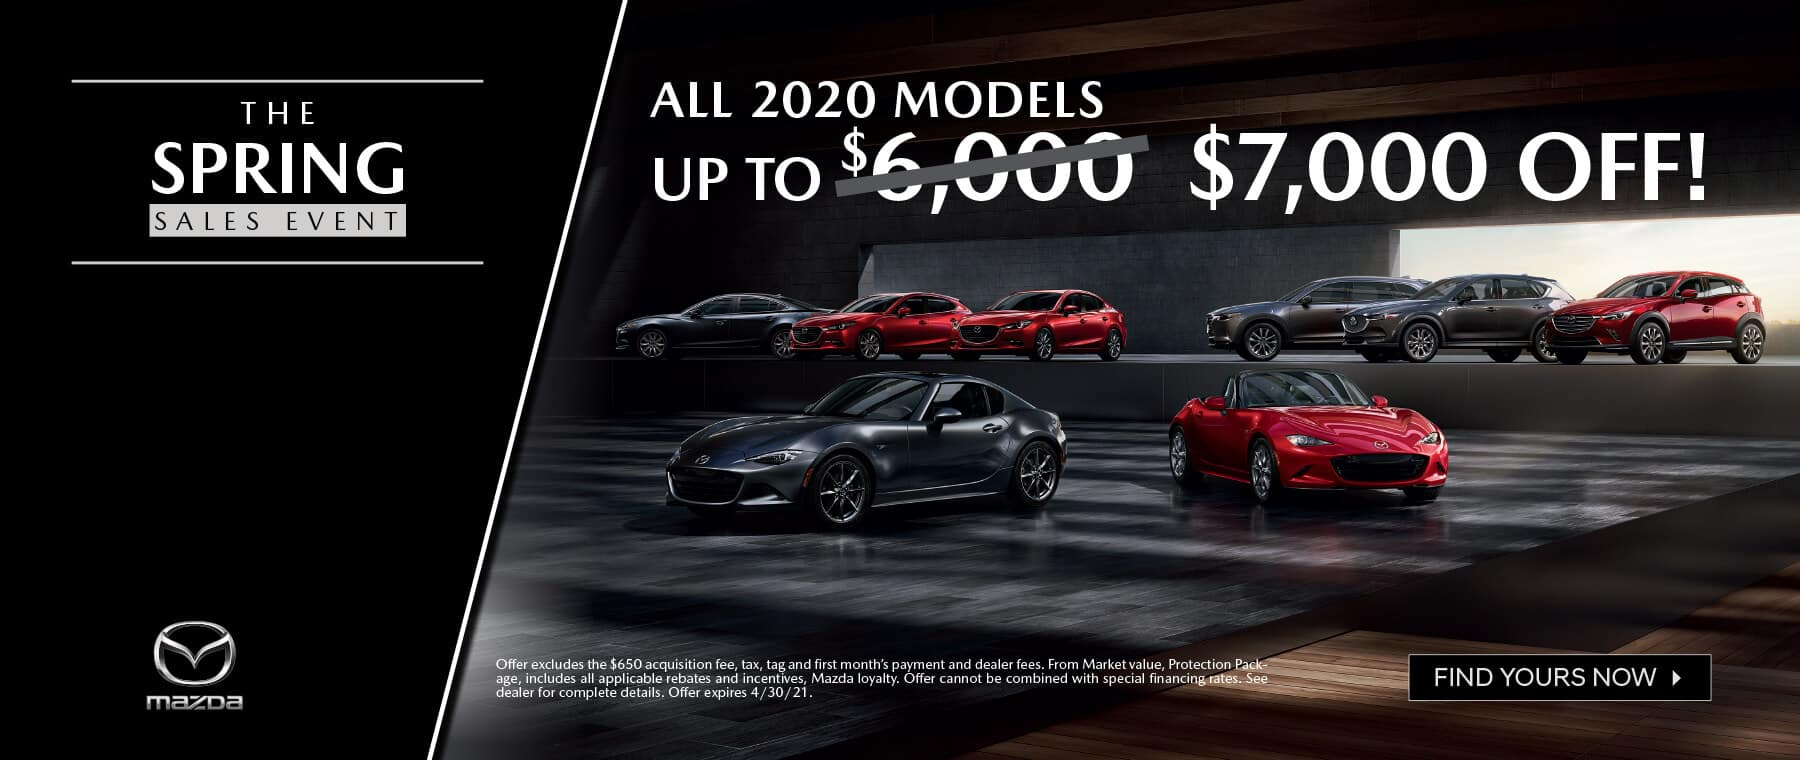 2021.04.15-Keffer-Mazda-APR-Web-Banner-Offer-Update-S51838vw-1